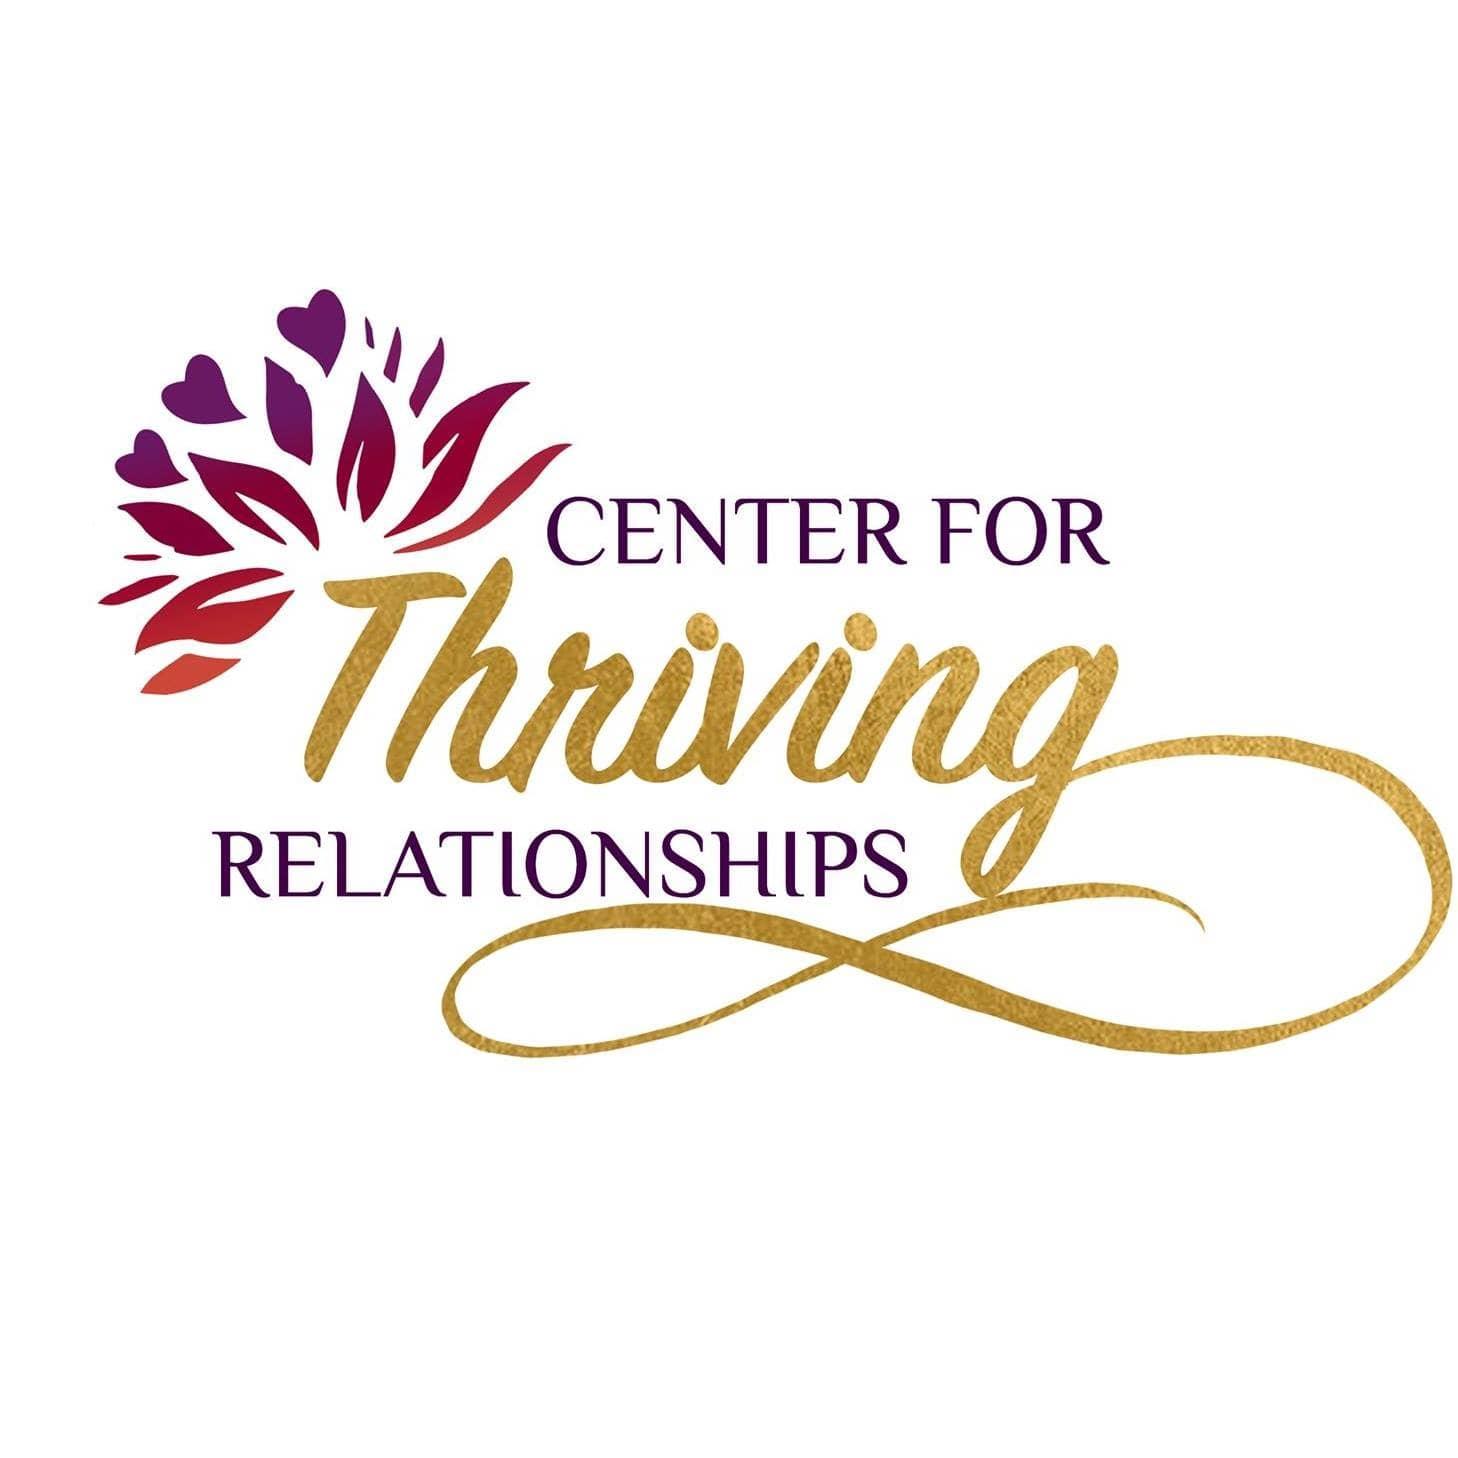 Center For Thriving Relationships